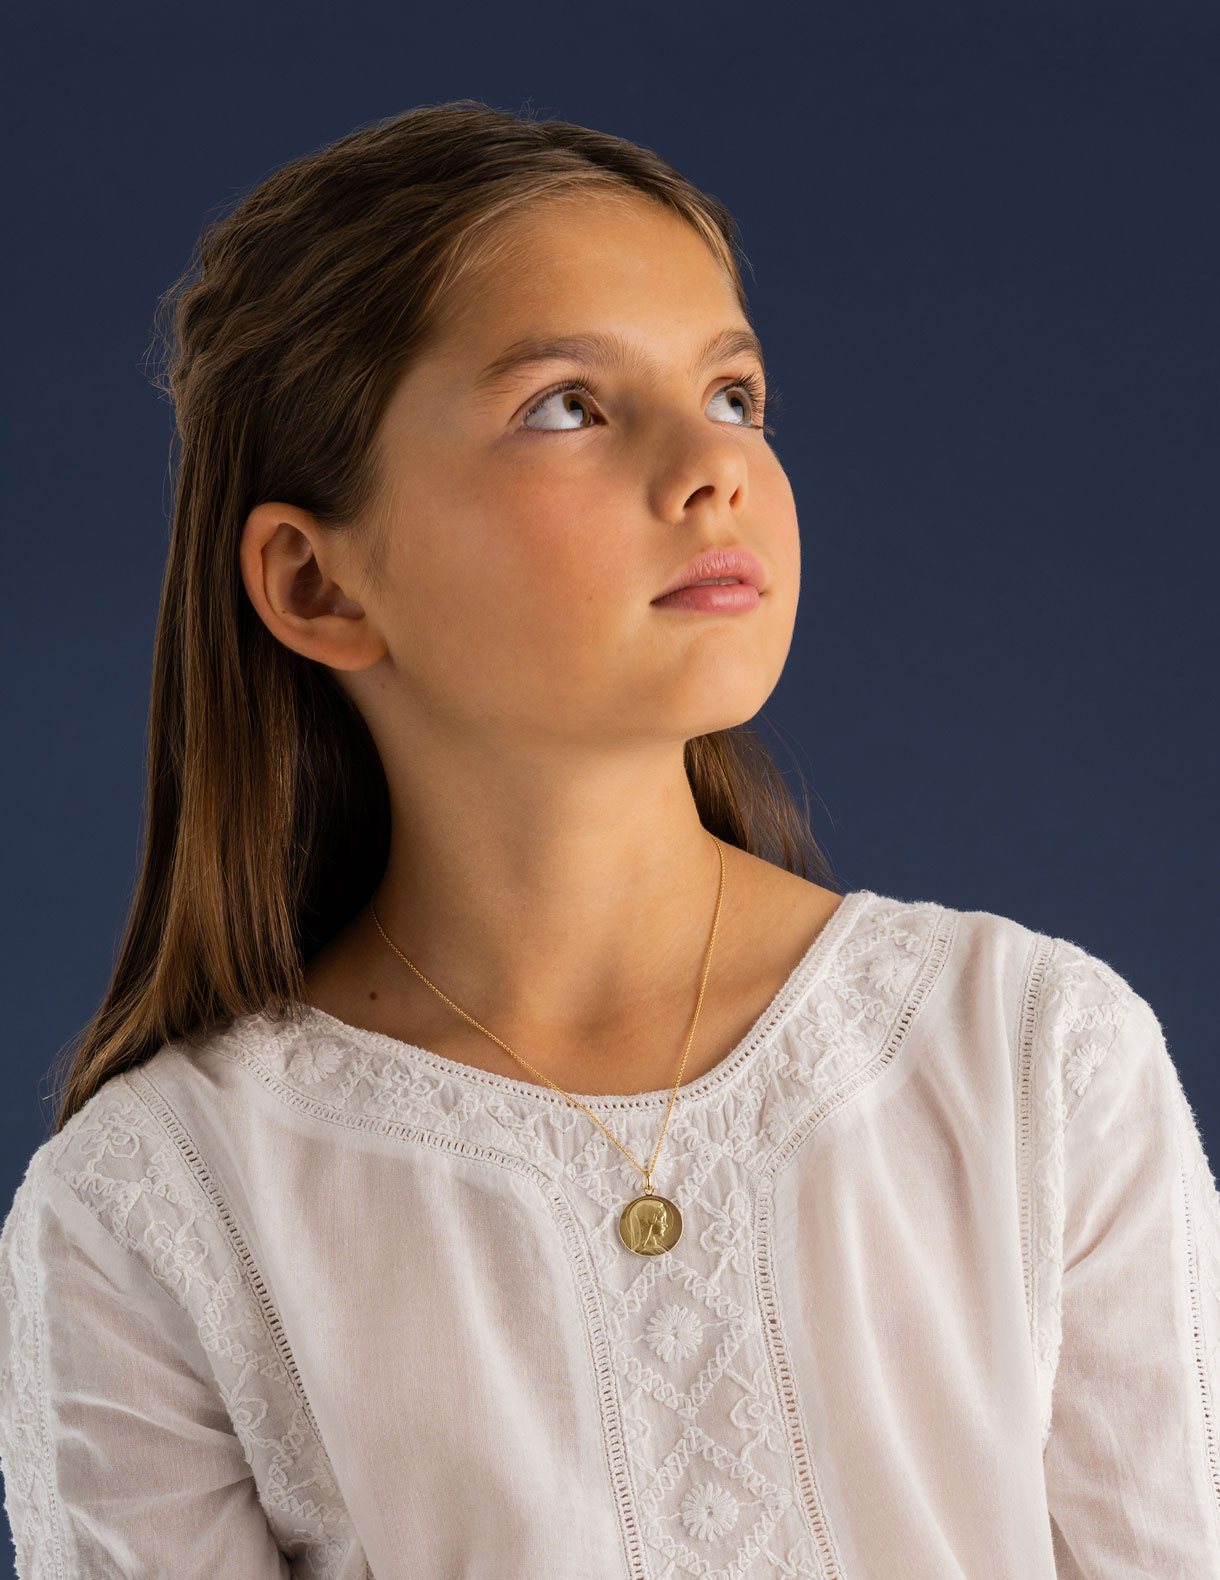 Médaille Fille Vierge Jeune